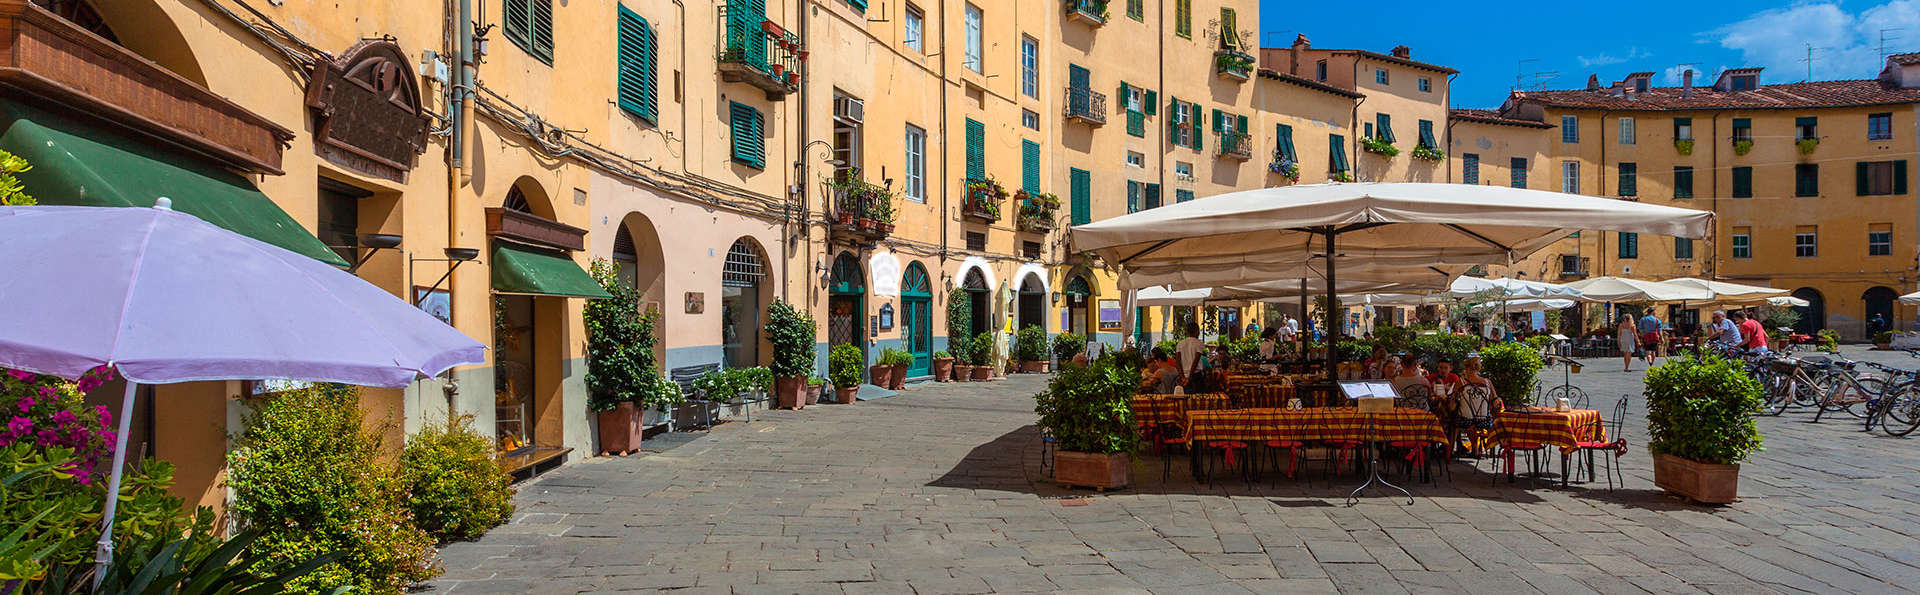 Hotel Ristorante Milano - EDIT_lucca1.jpg